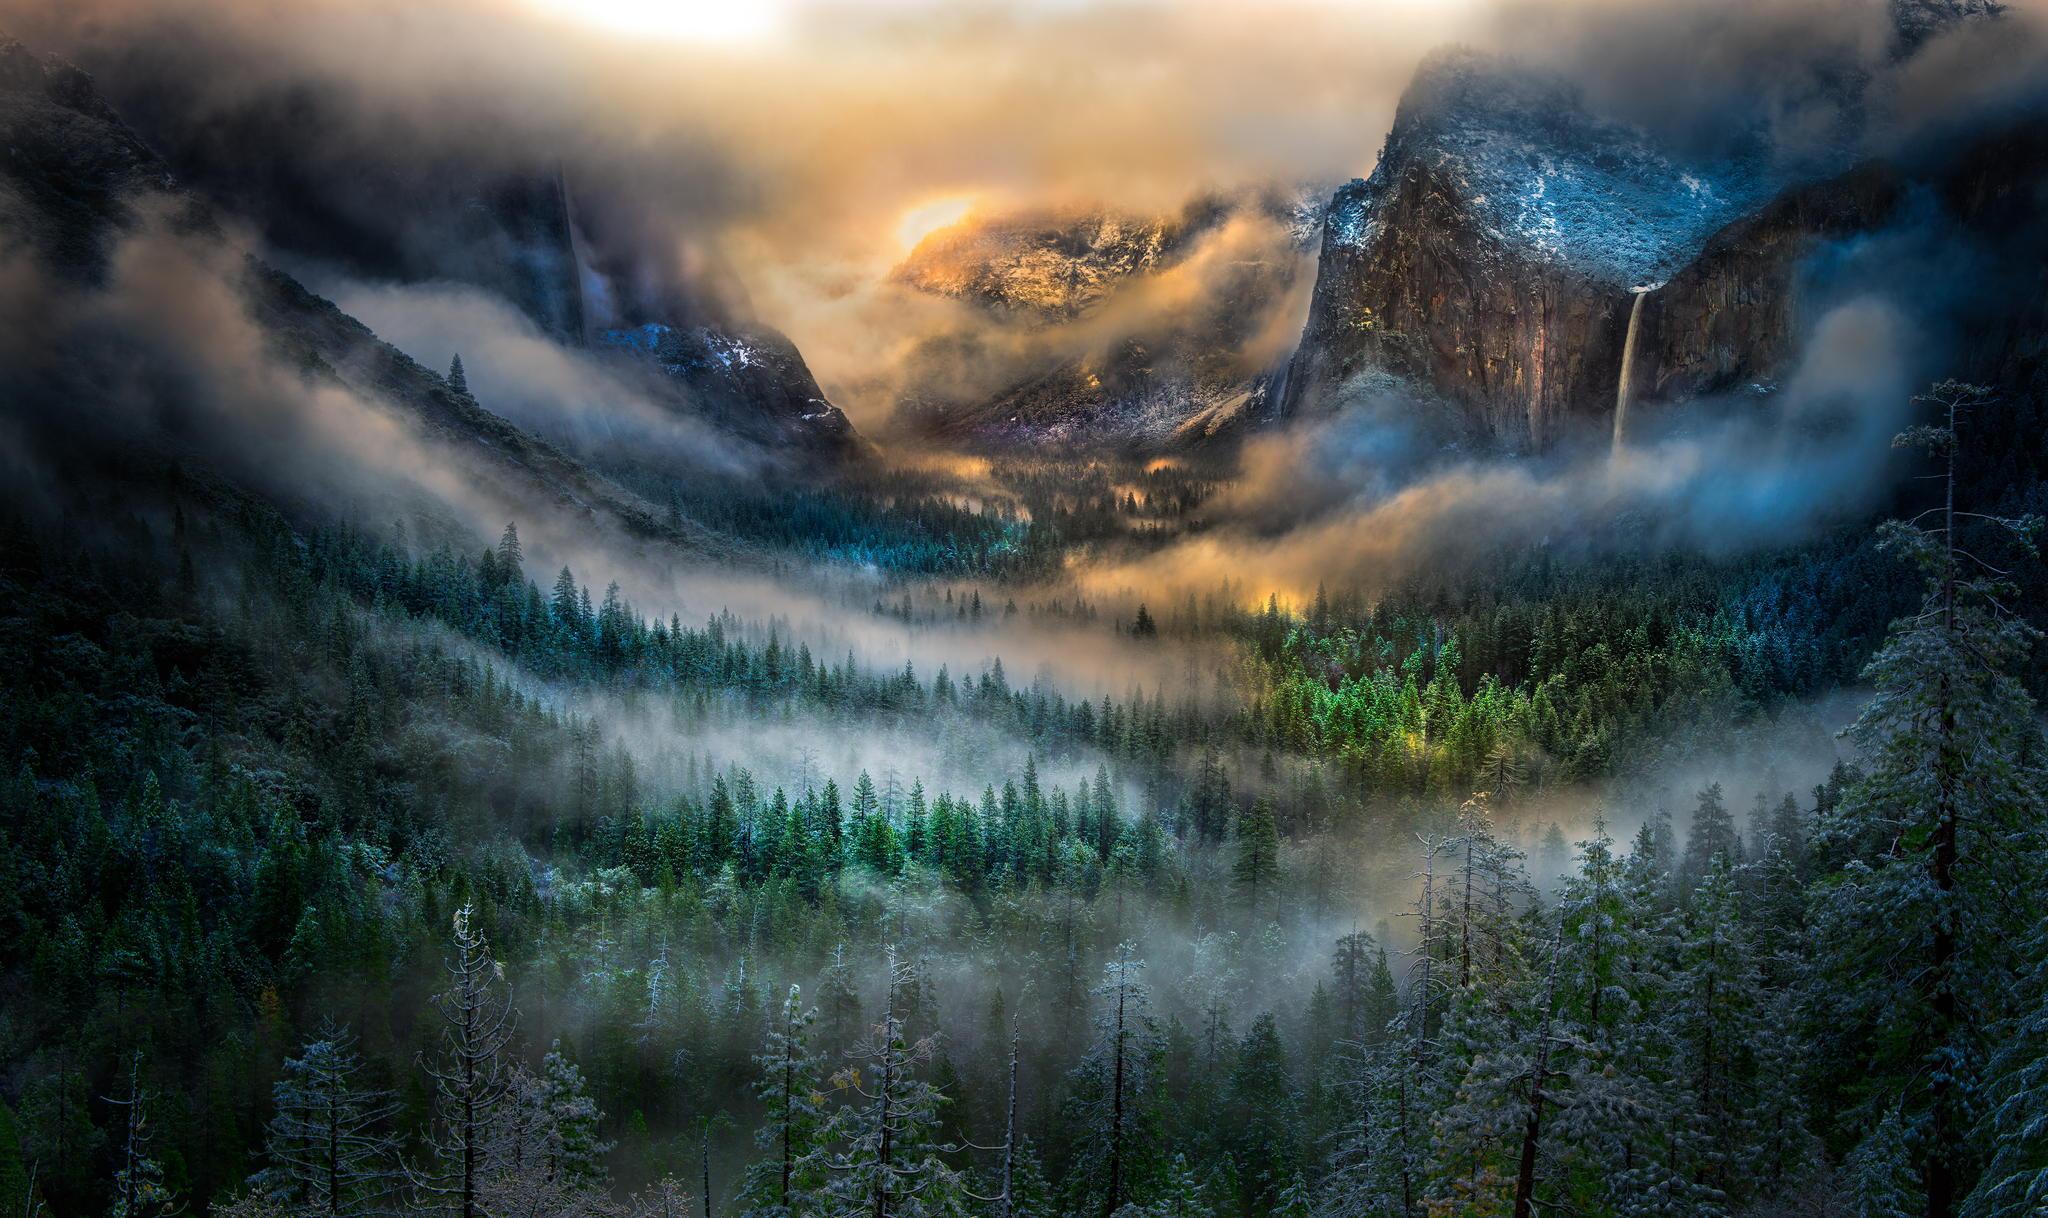 Yosemite National Park Clouds 23202 Wallpaper Wallpaper hd 2048x1218